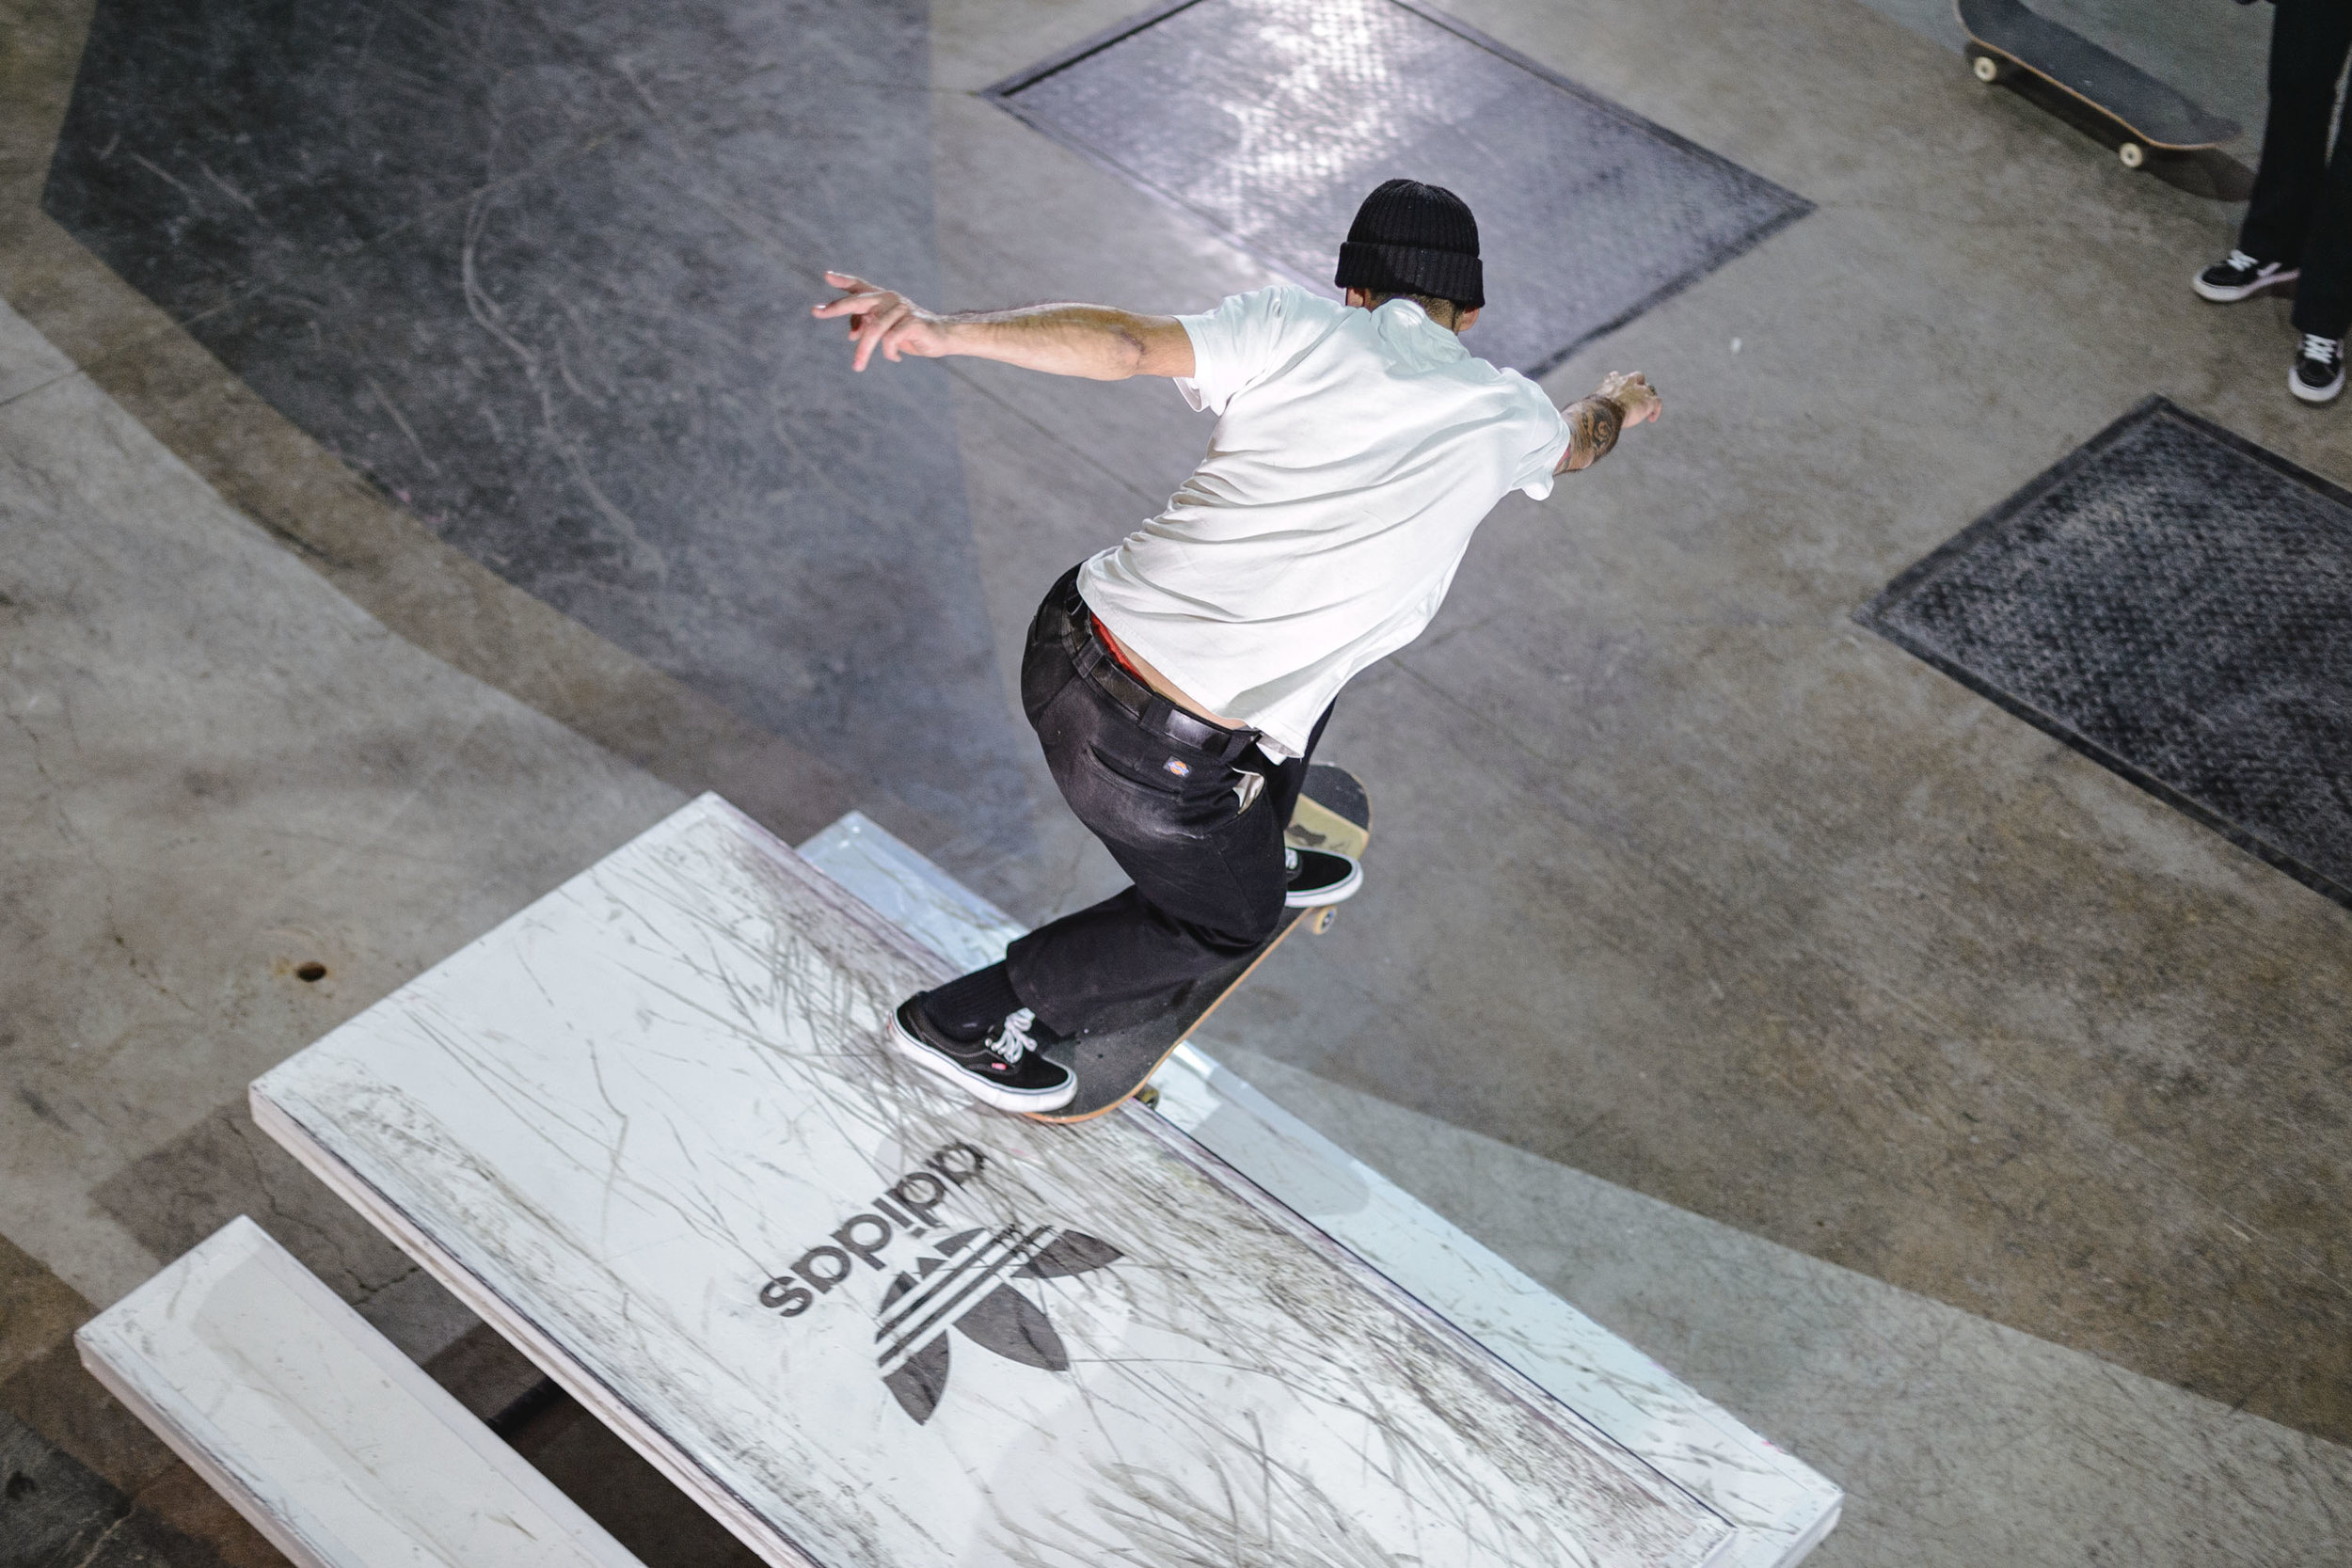 adidas x below skate jam -